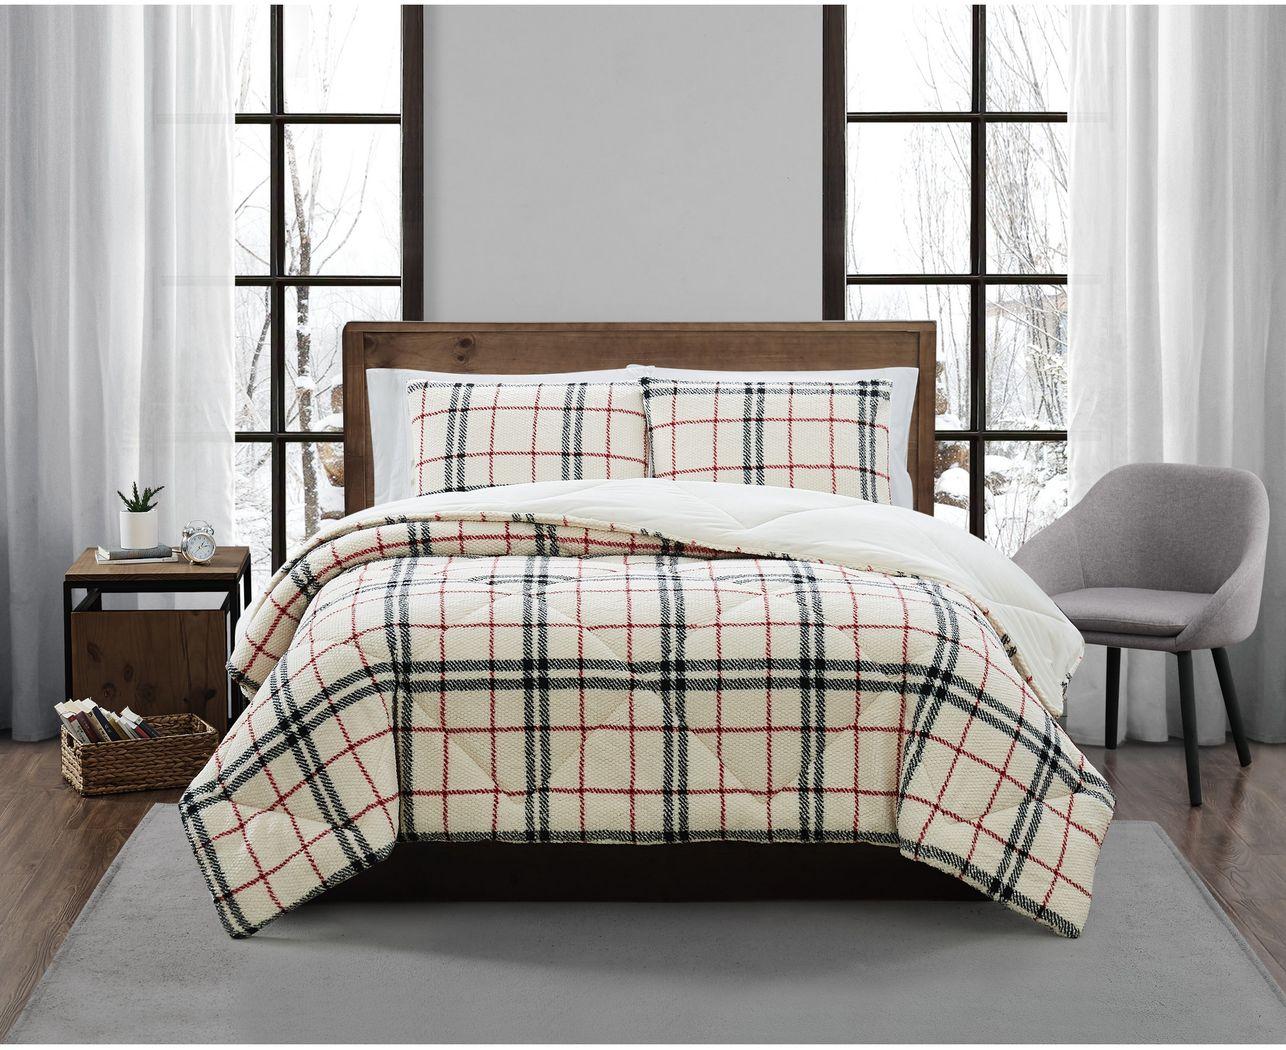 Kids Urban Cabin Black 2 Pc Twin XL Comforter Set